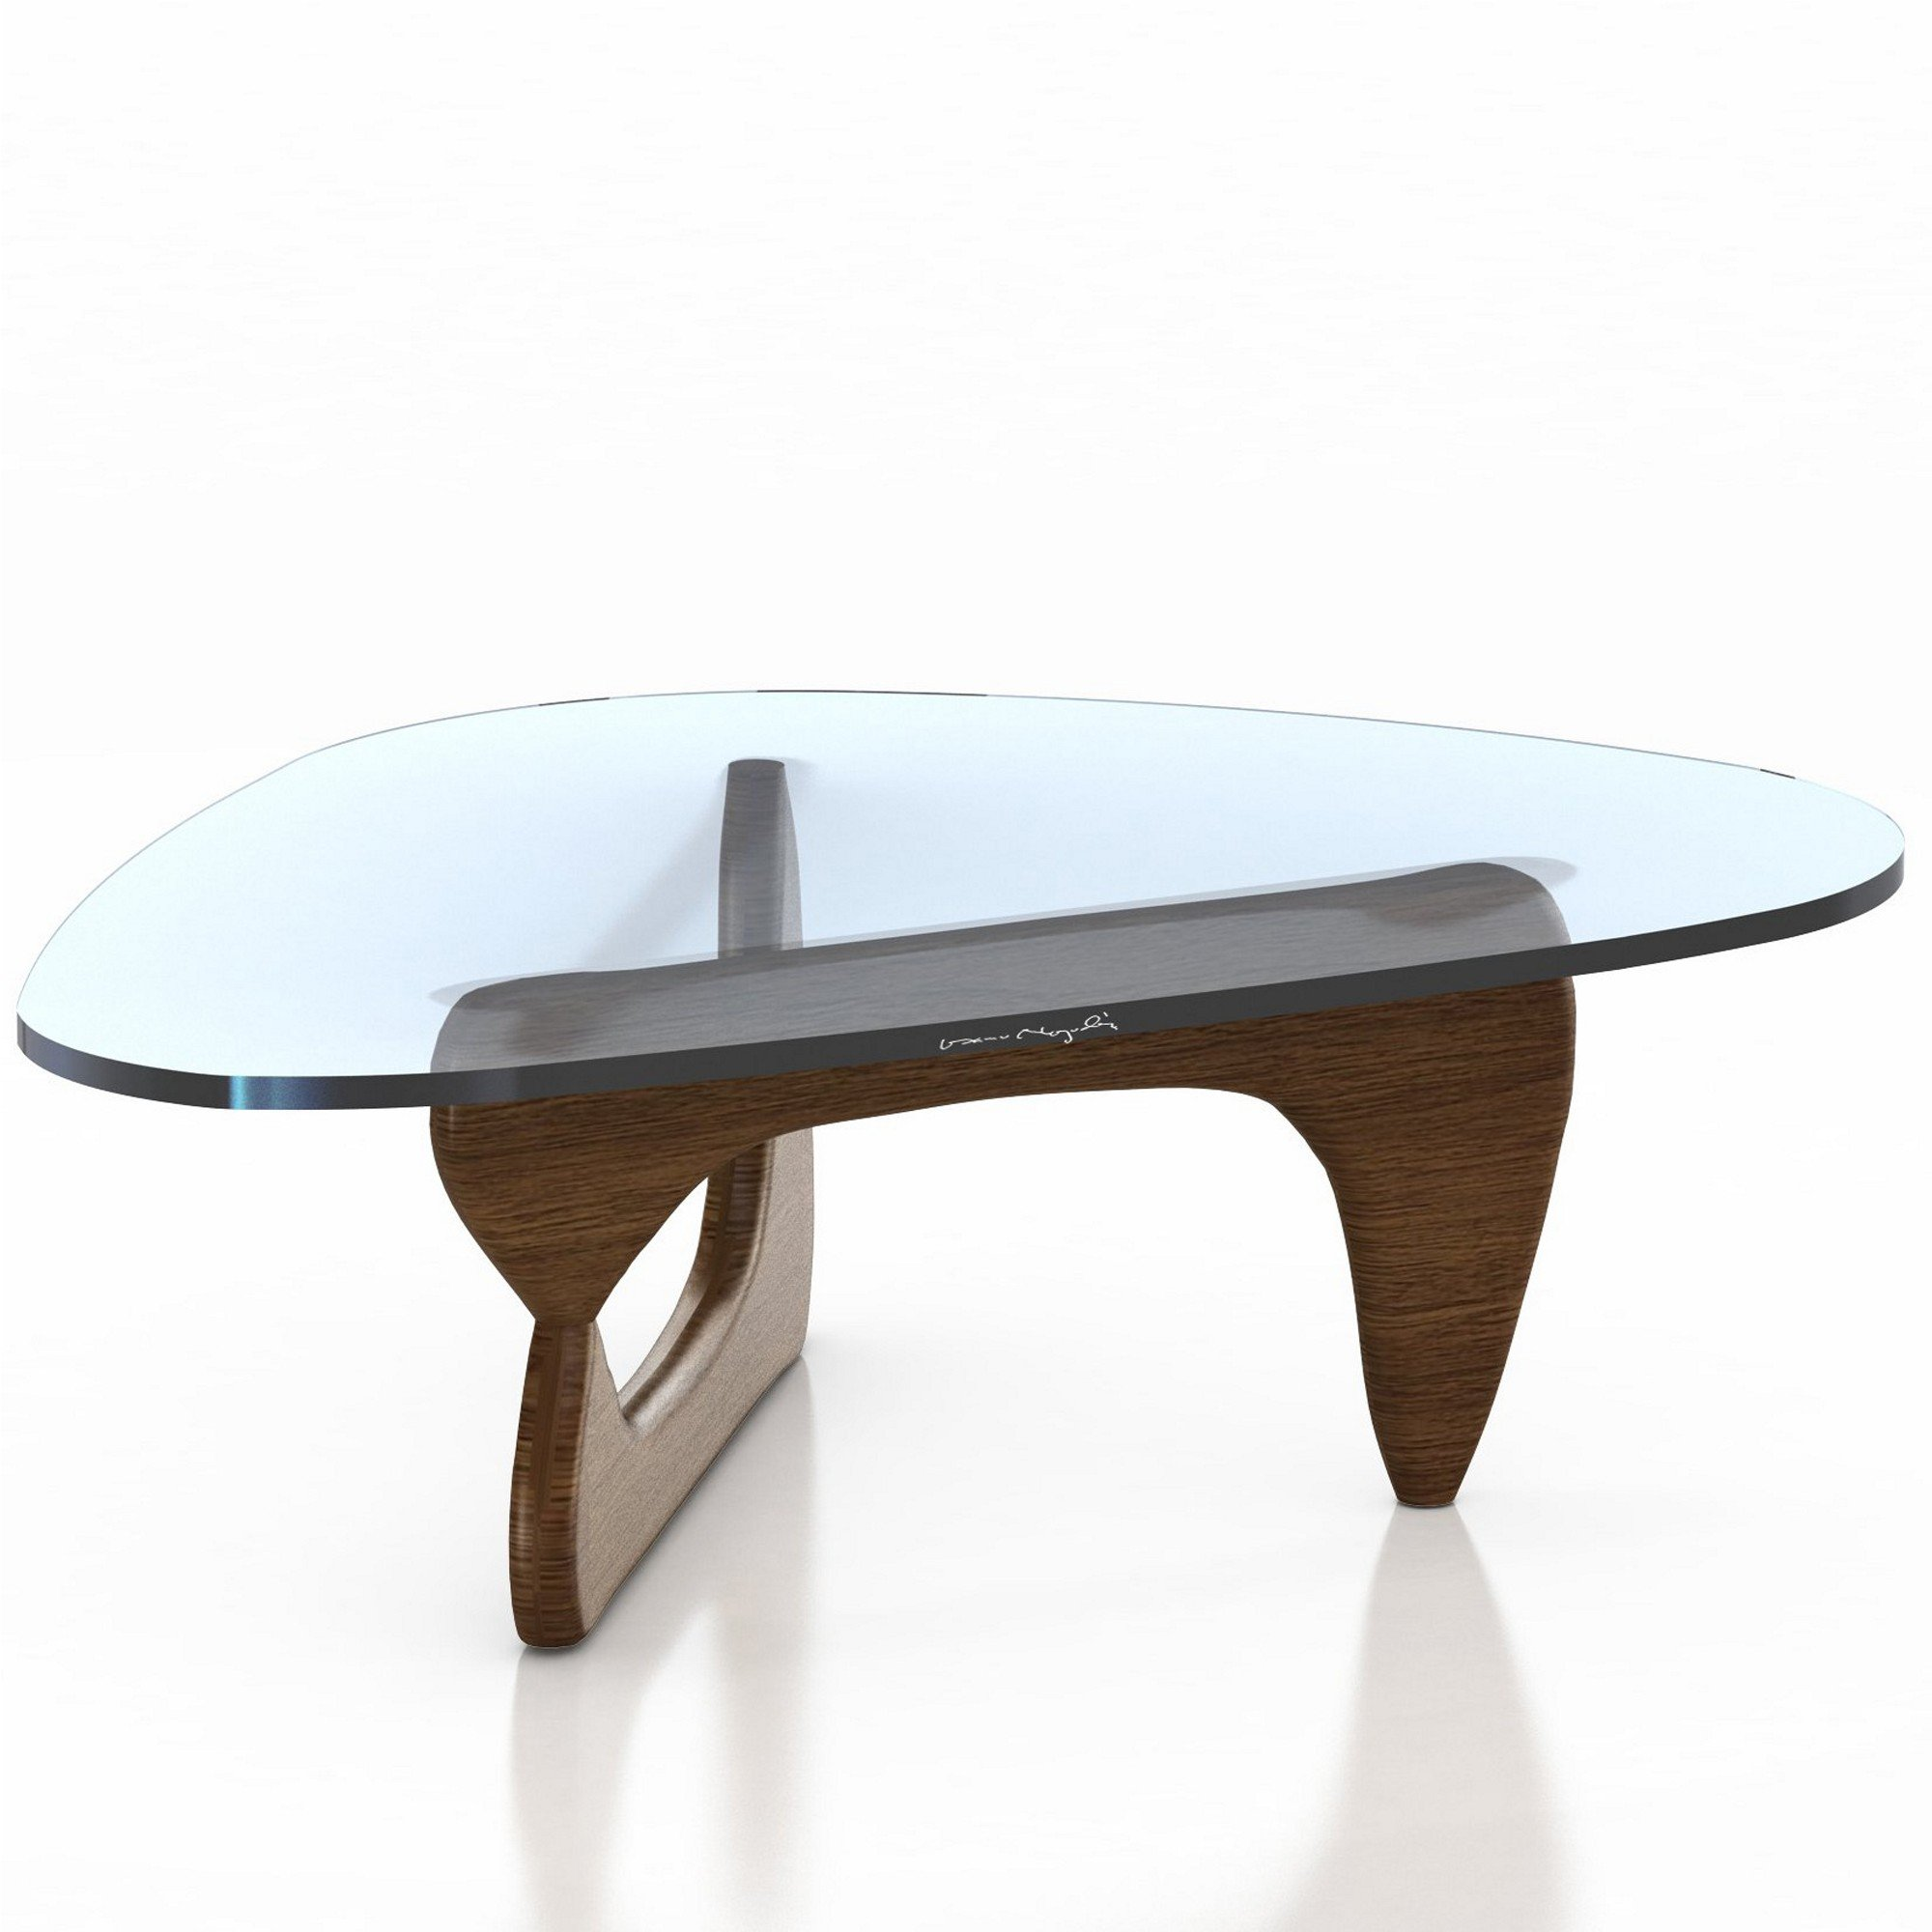 Modern Wood And Glass Coffee Table Modern Centre Table Designs Noguchi Table Coffee Table [ 2000 x 2000 Pixel ]